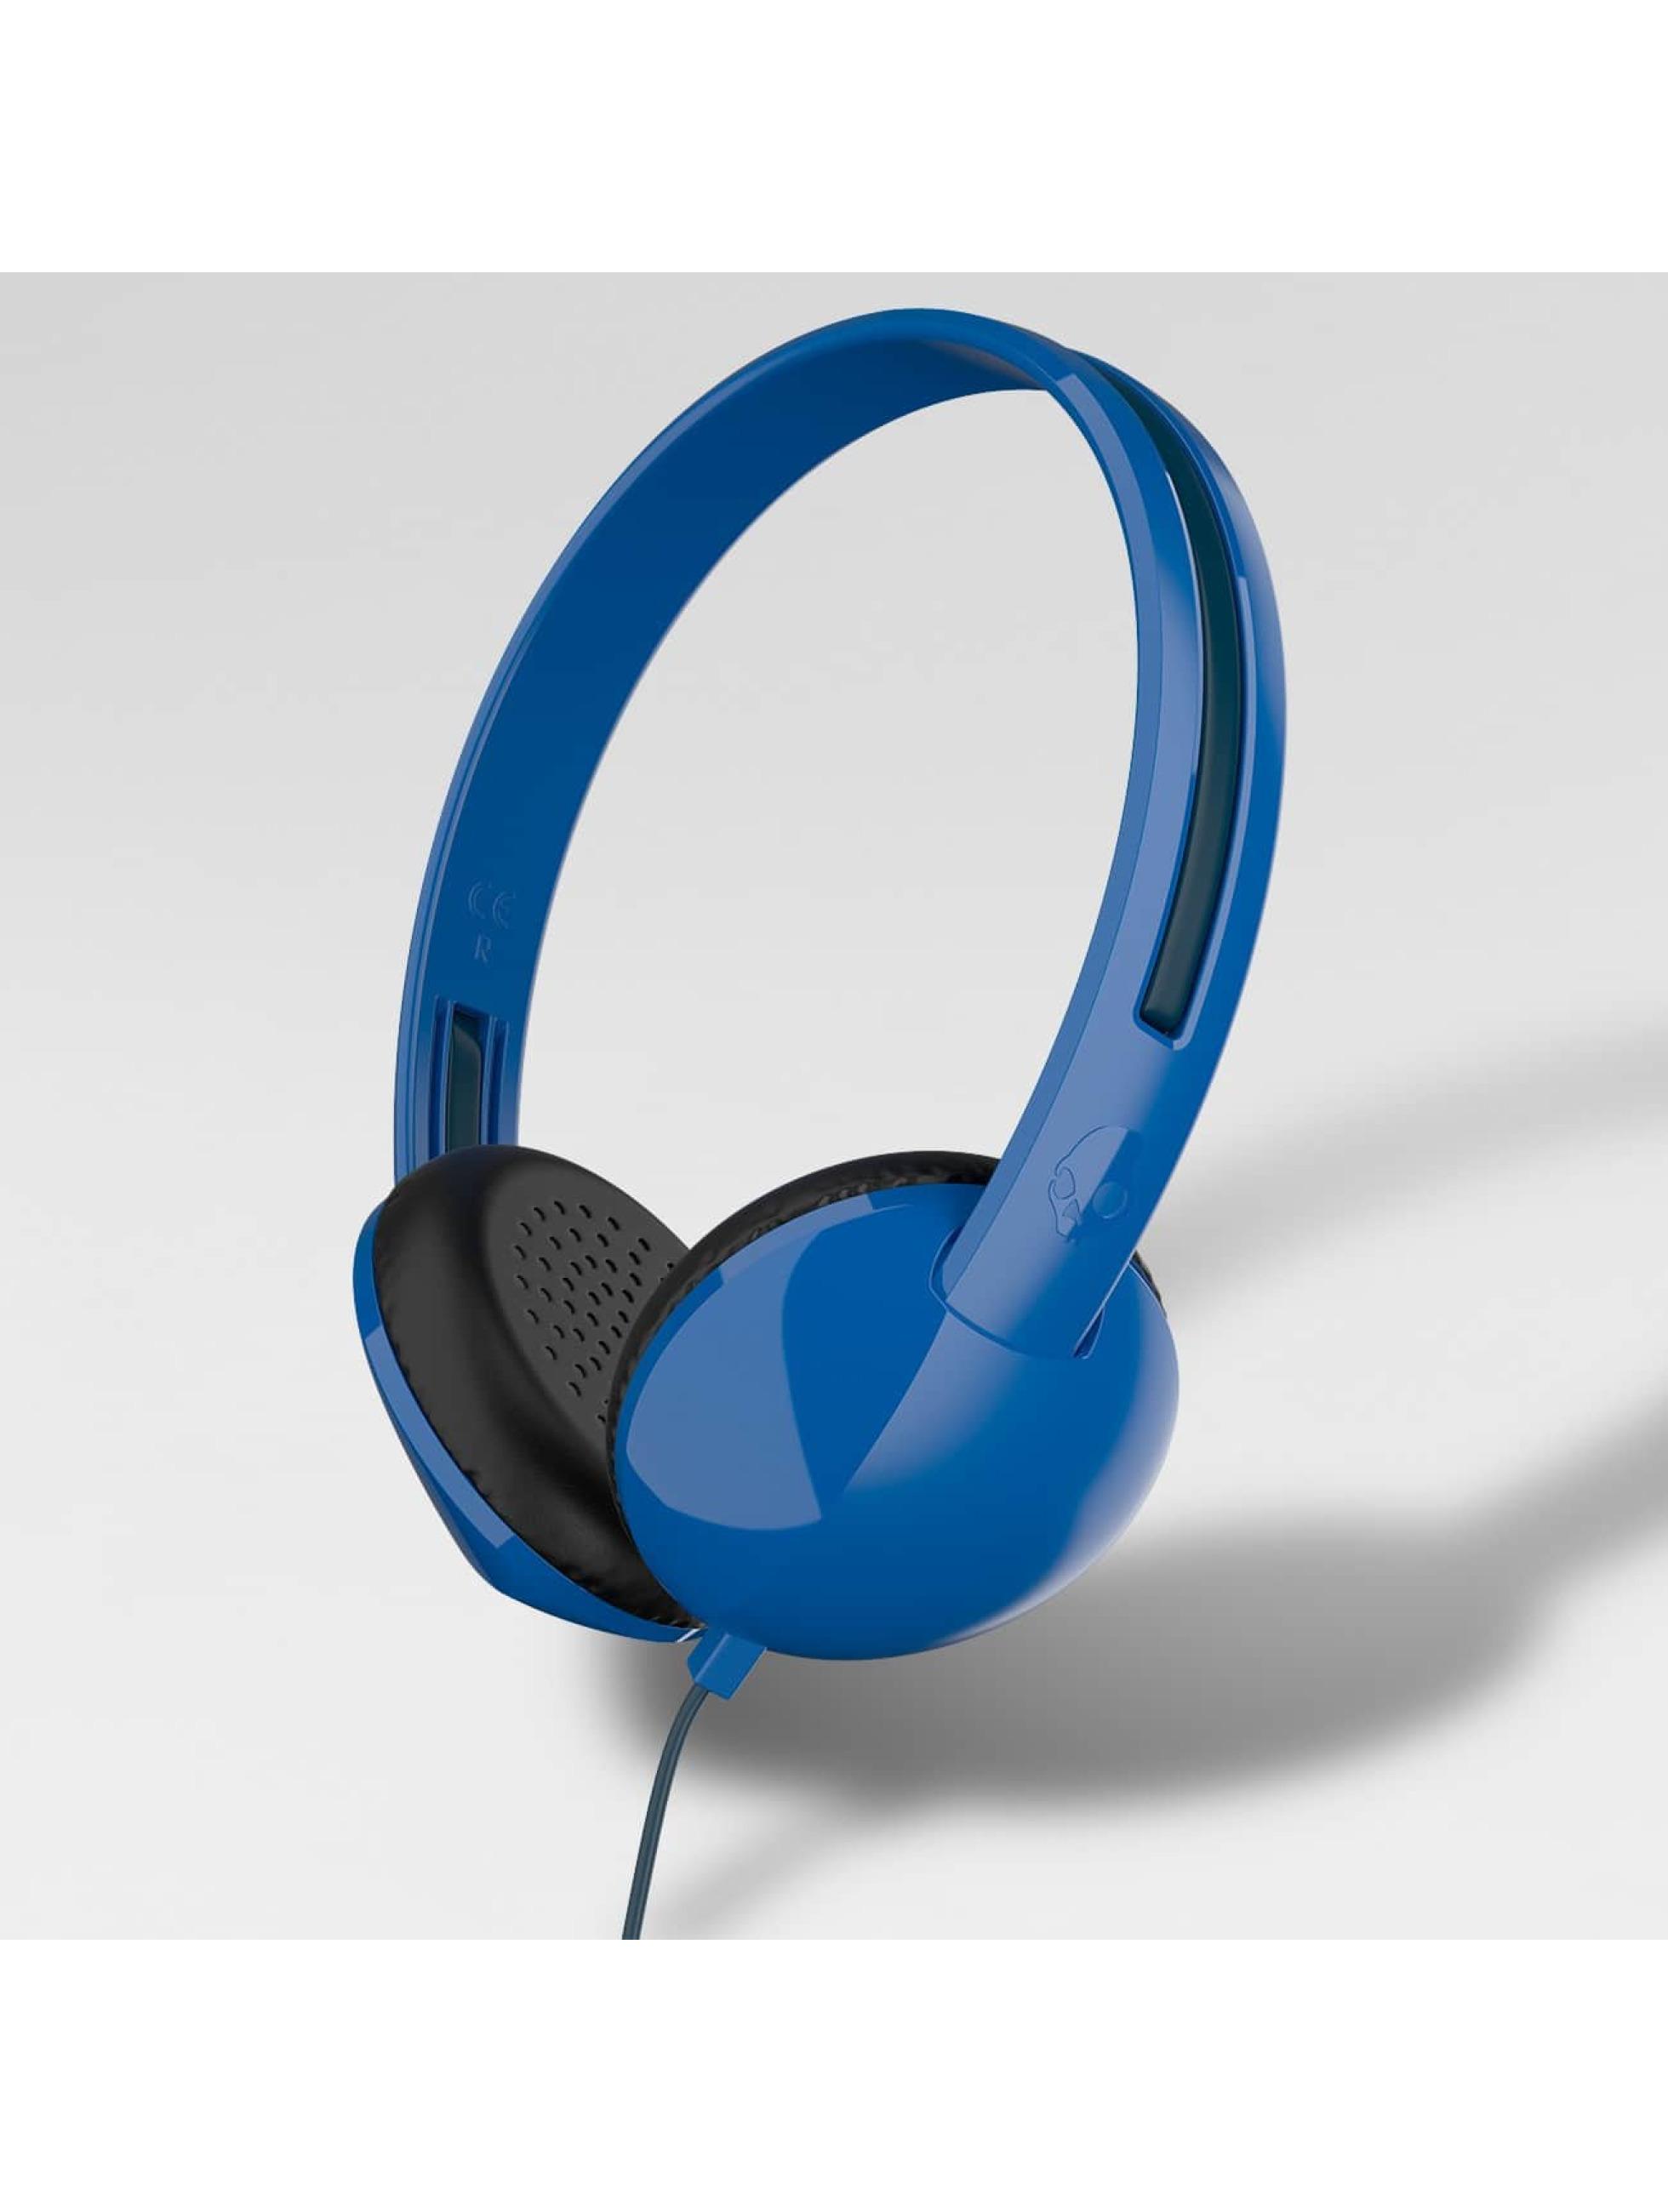 Skullcandy Słuchawki Stim Mic 1 On Ear niebieski